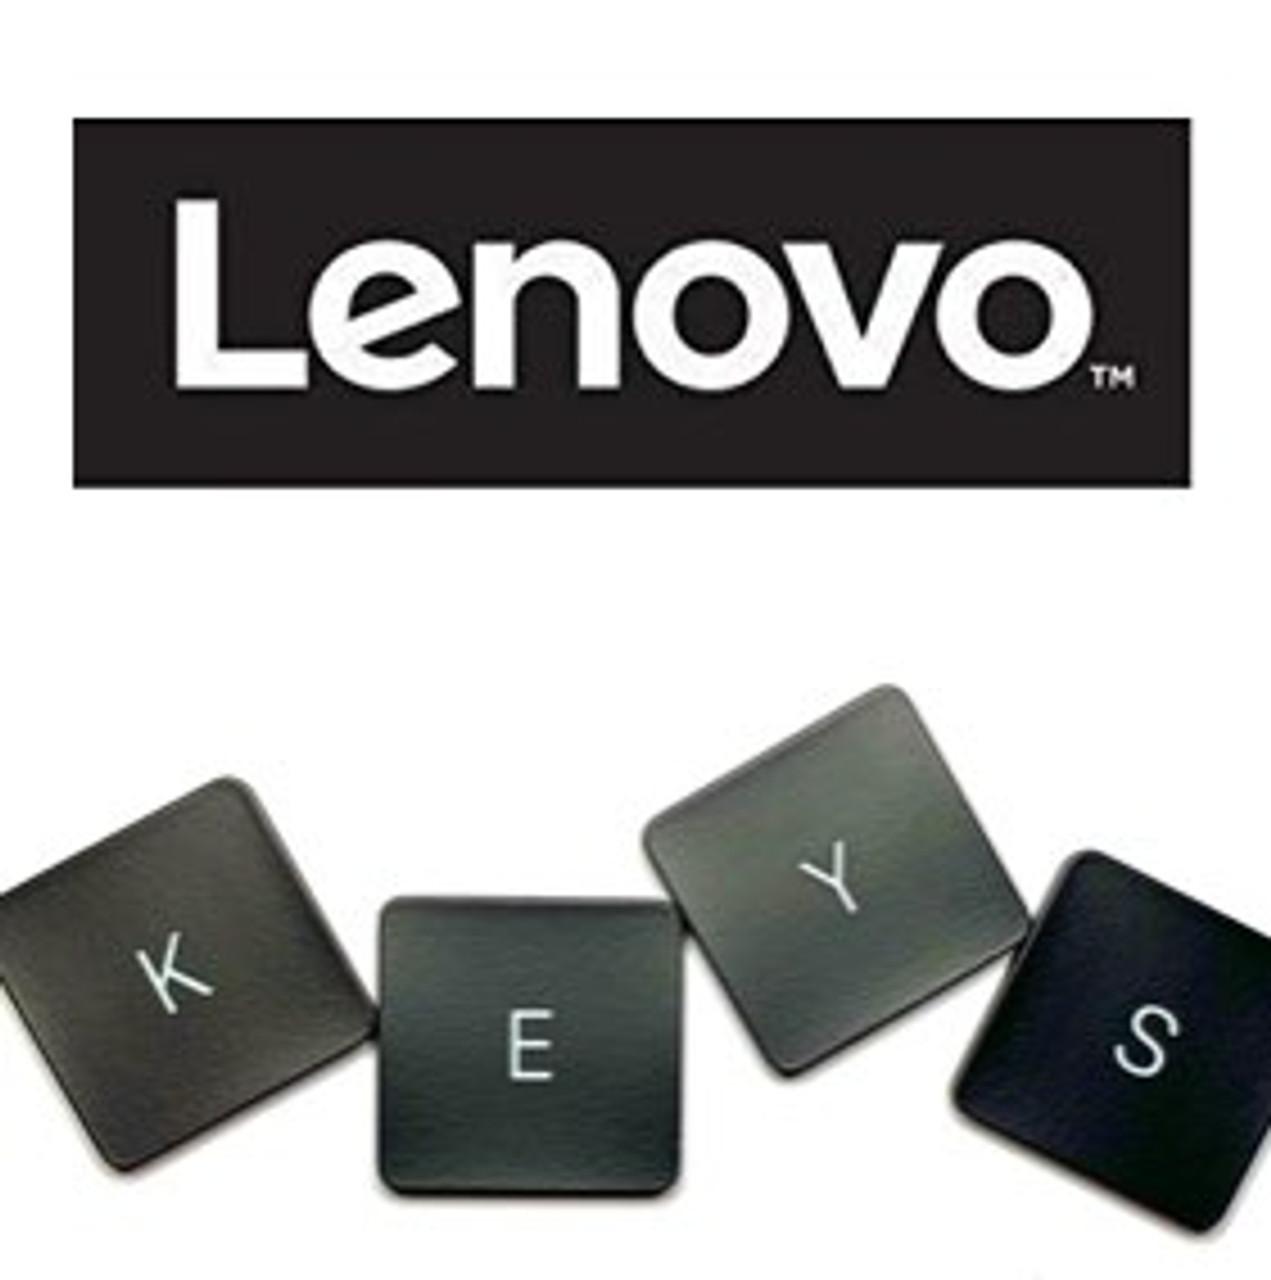 Lenovo Yoga 3 Pro 13 Laptop Keyboard Key Replacement